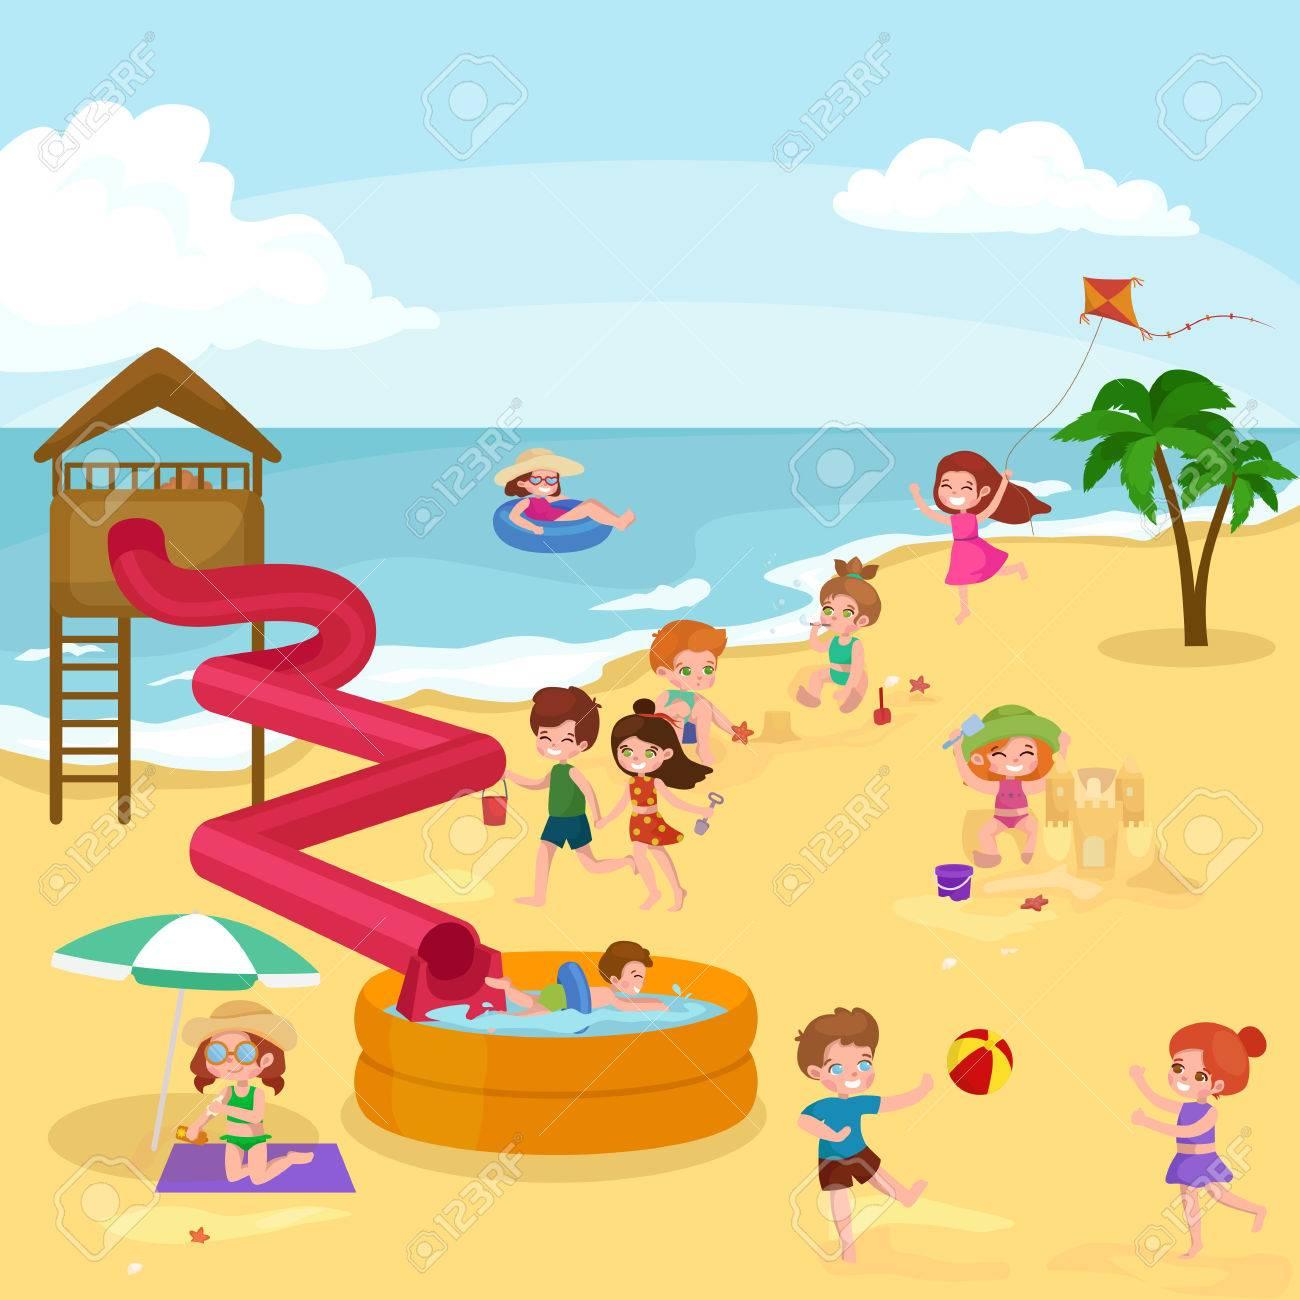 Children Summer Vacation Kids Playing Sand Around Water On Beach Cute Little Girl In